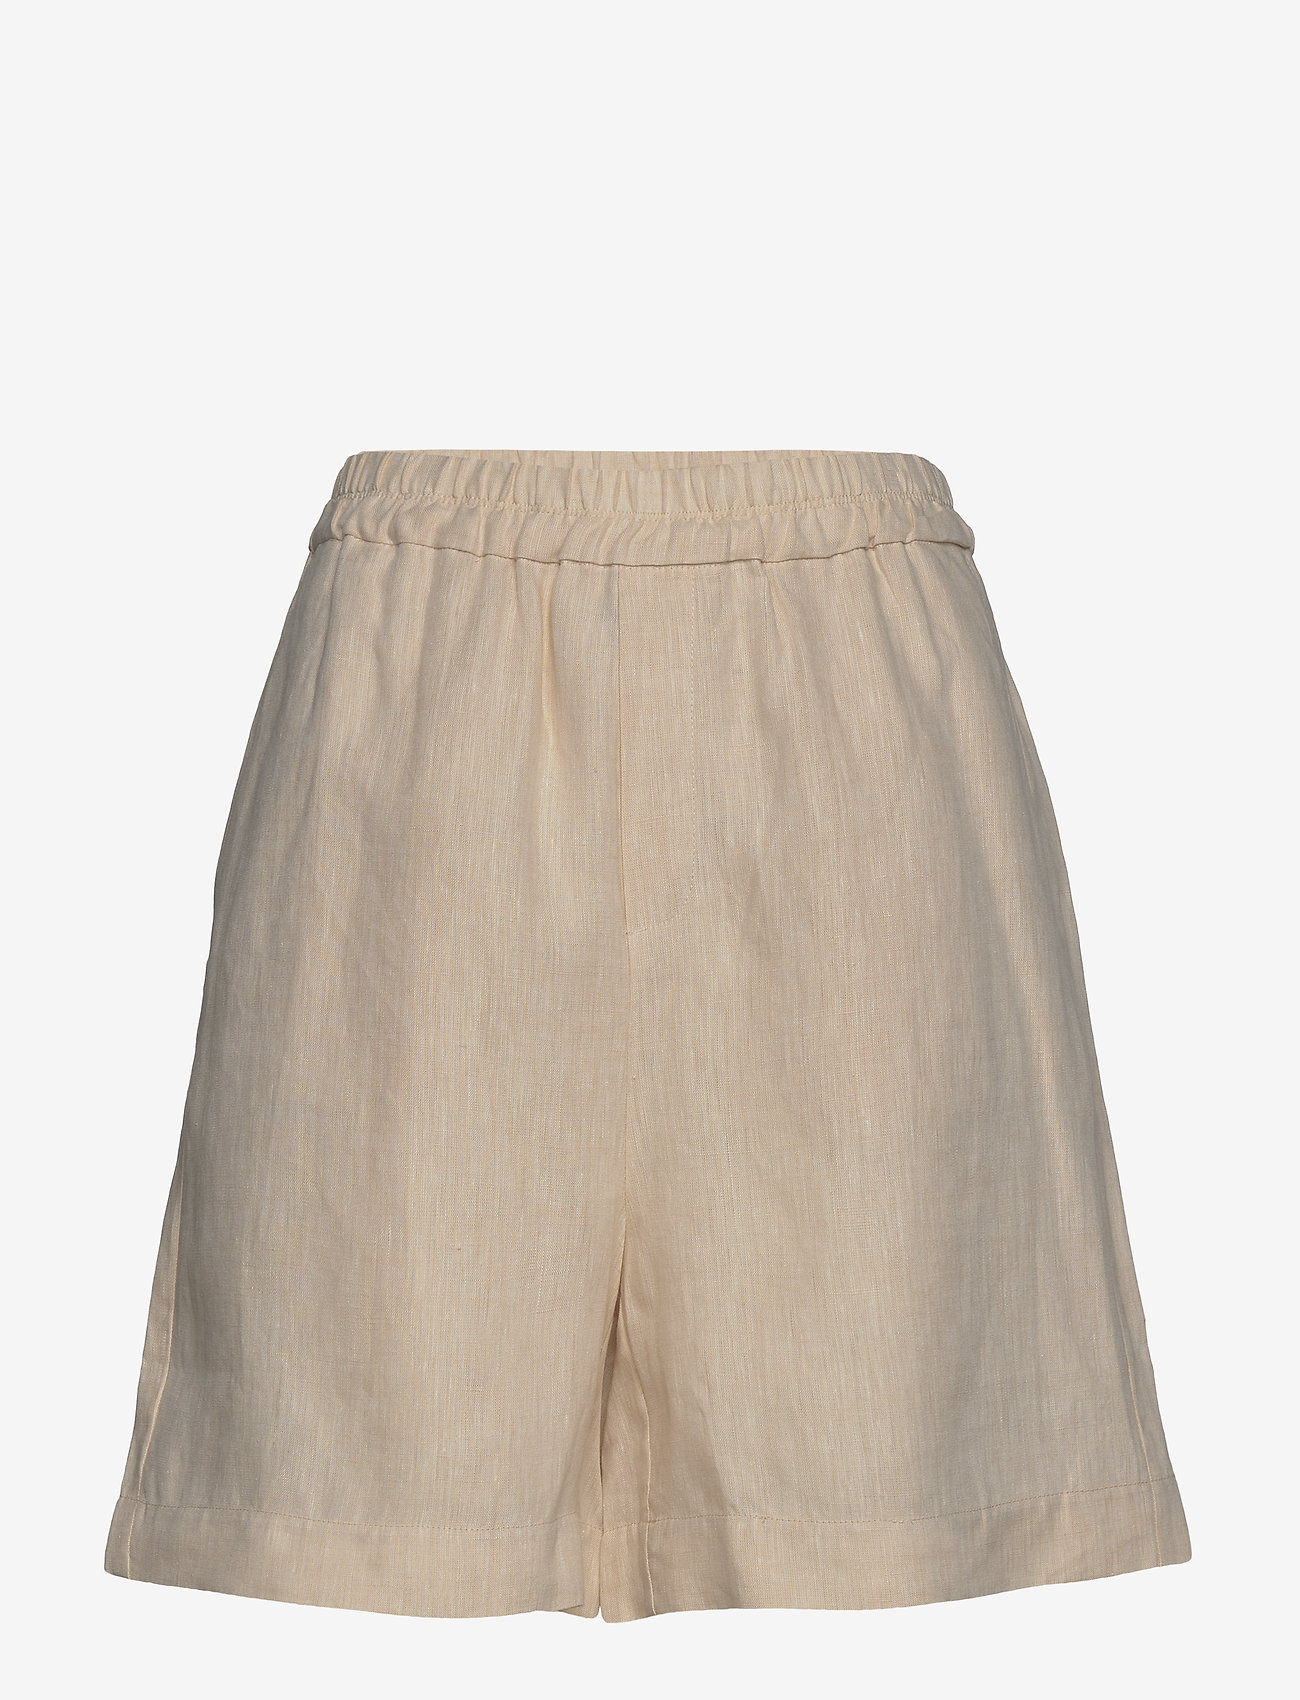 Noa Noa - Shorts - casual korte broeken - natural linen - 0